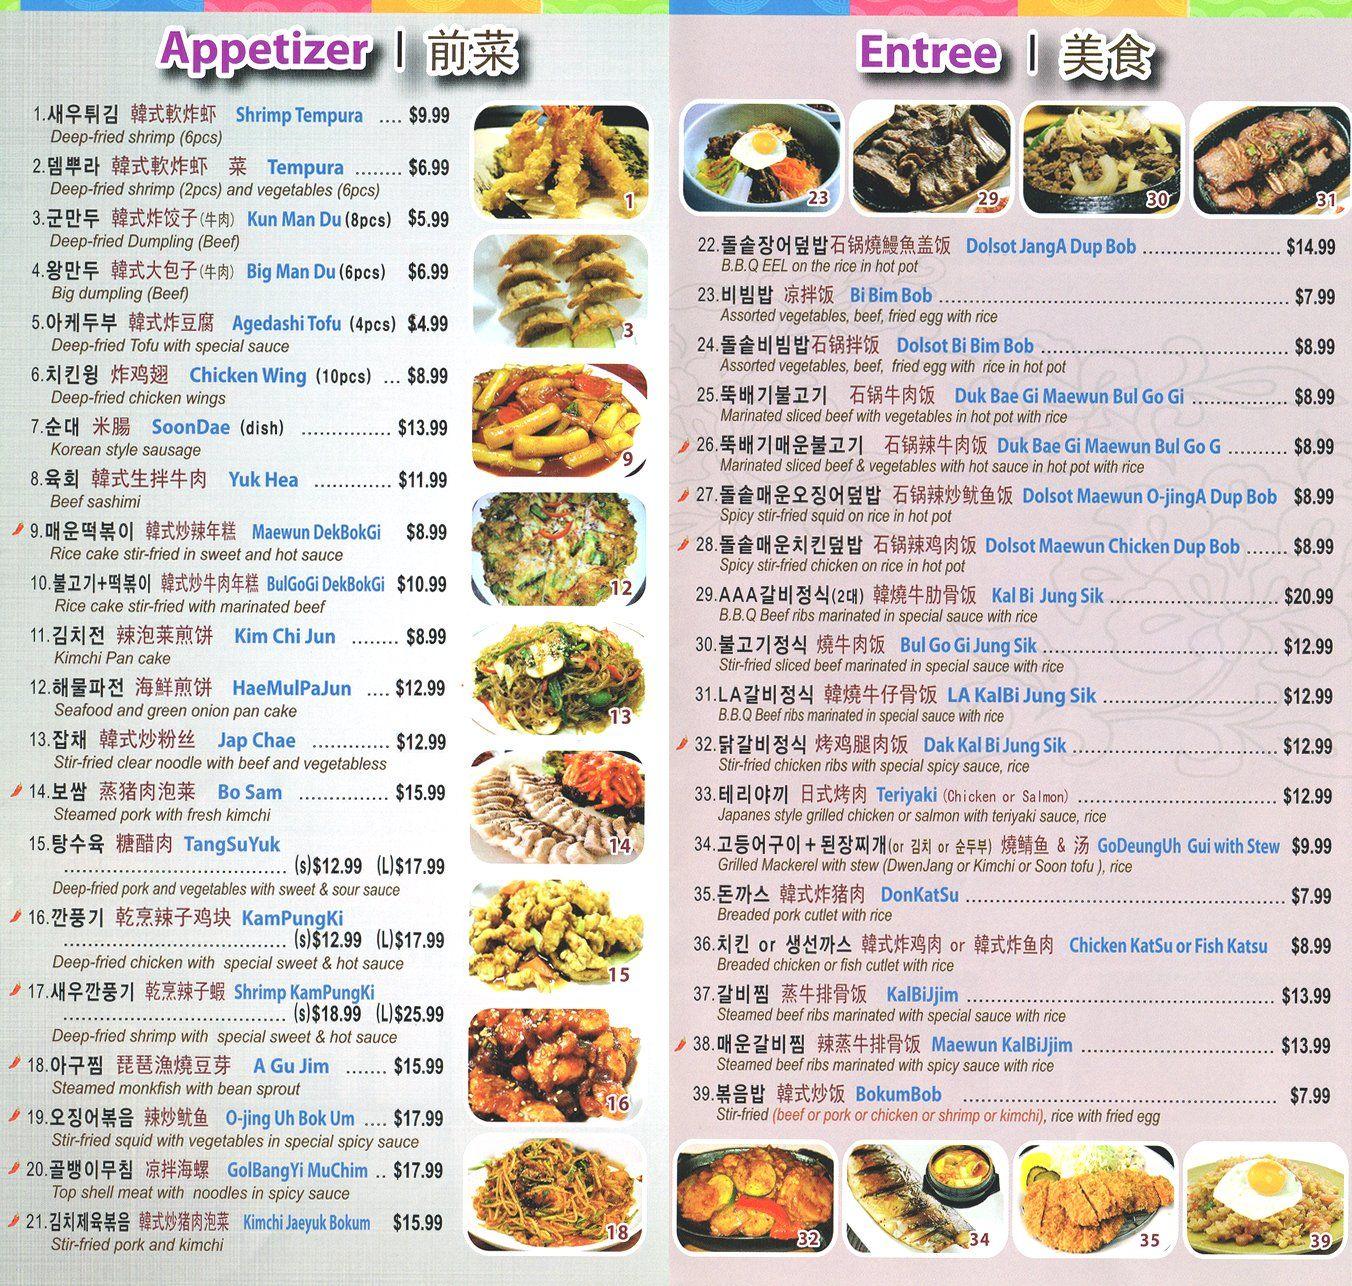 seoul garden menu 905 305 0699 4350 steeles ave e markham - Seoul Garden Menu